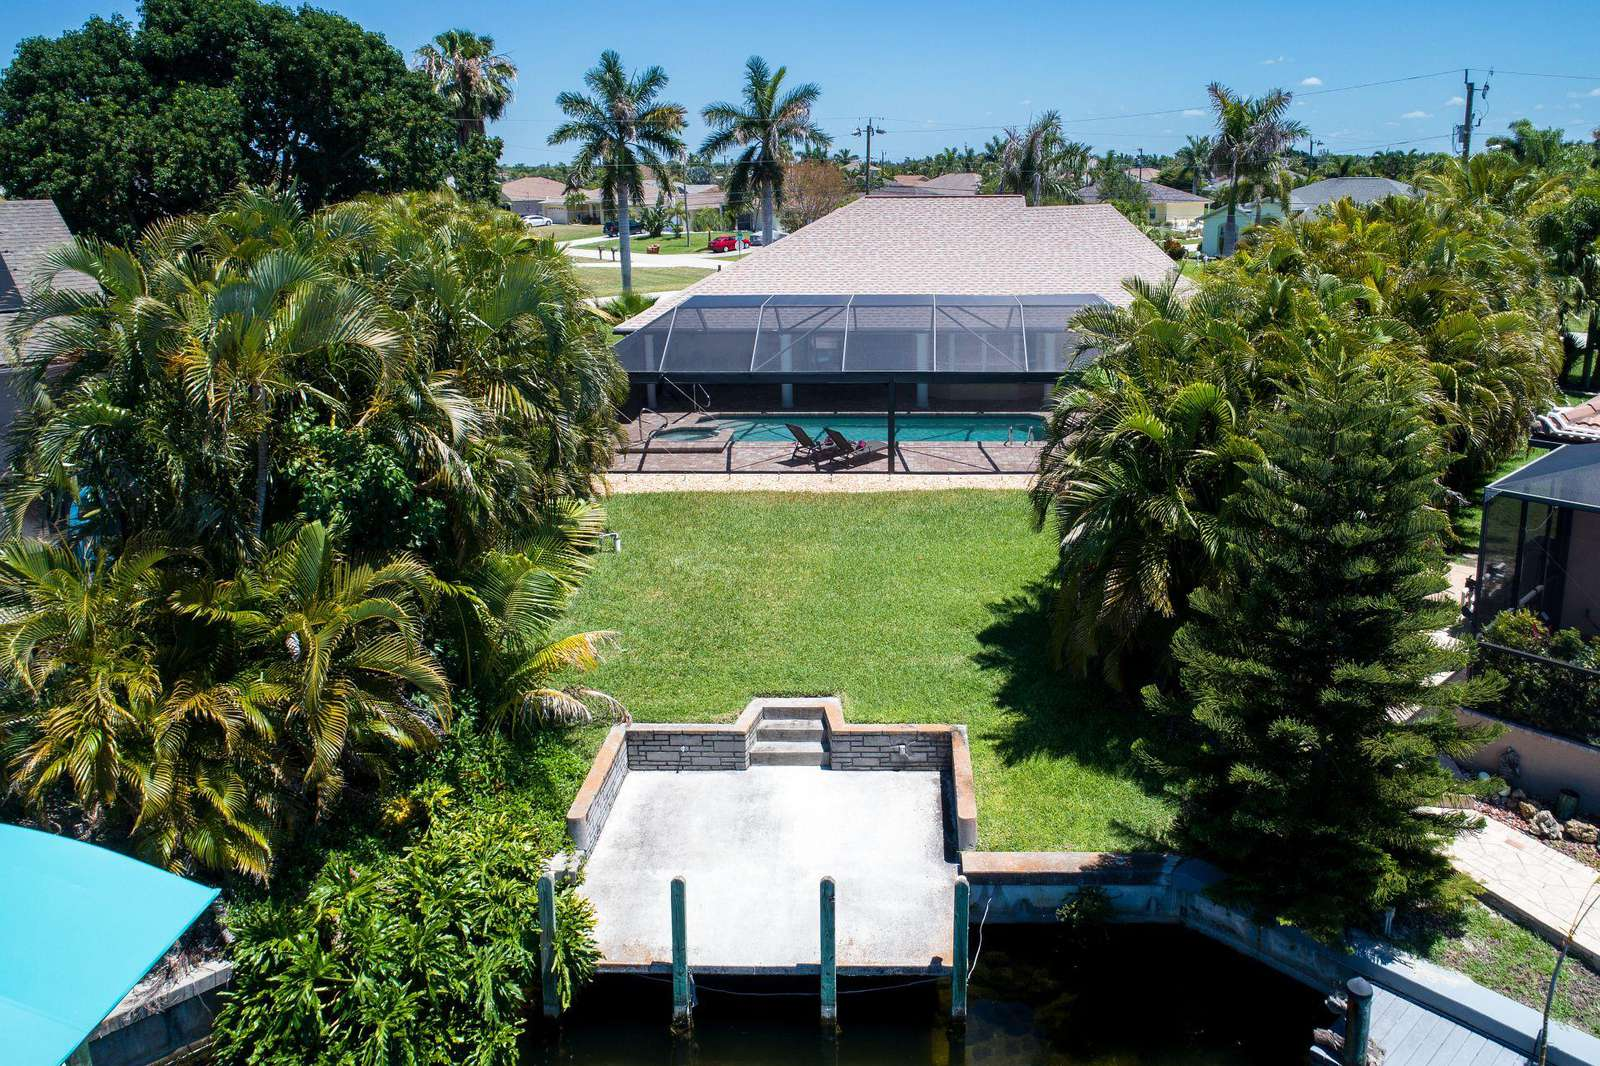 Wischis Florida Home - Ferienvilla Cape Coral- Treasure Island - Hausverwaltung - Immobilien